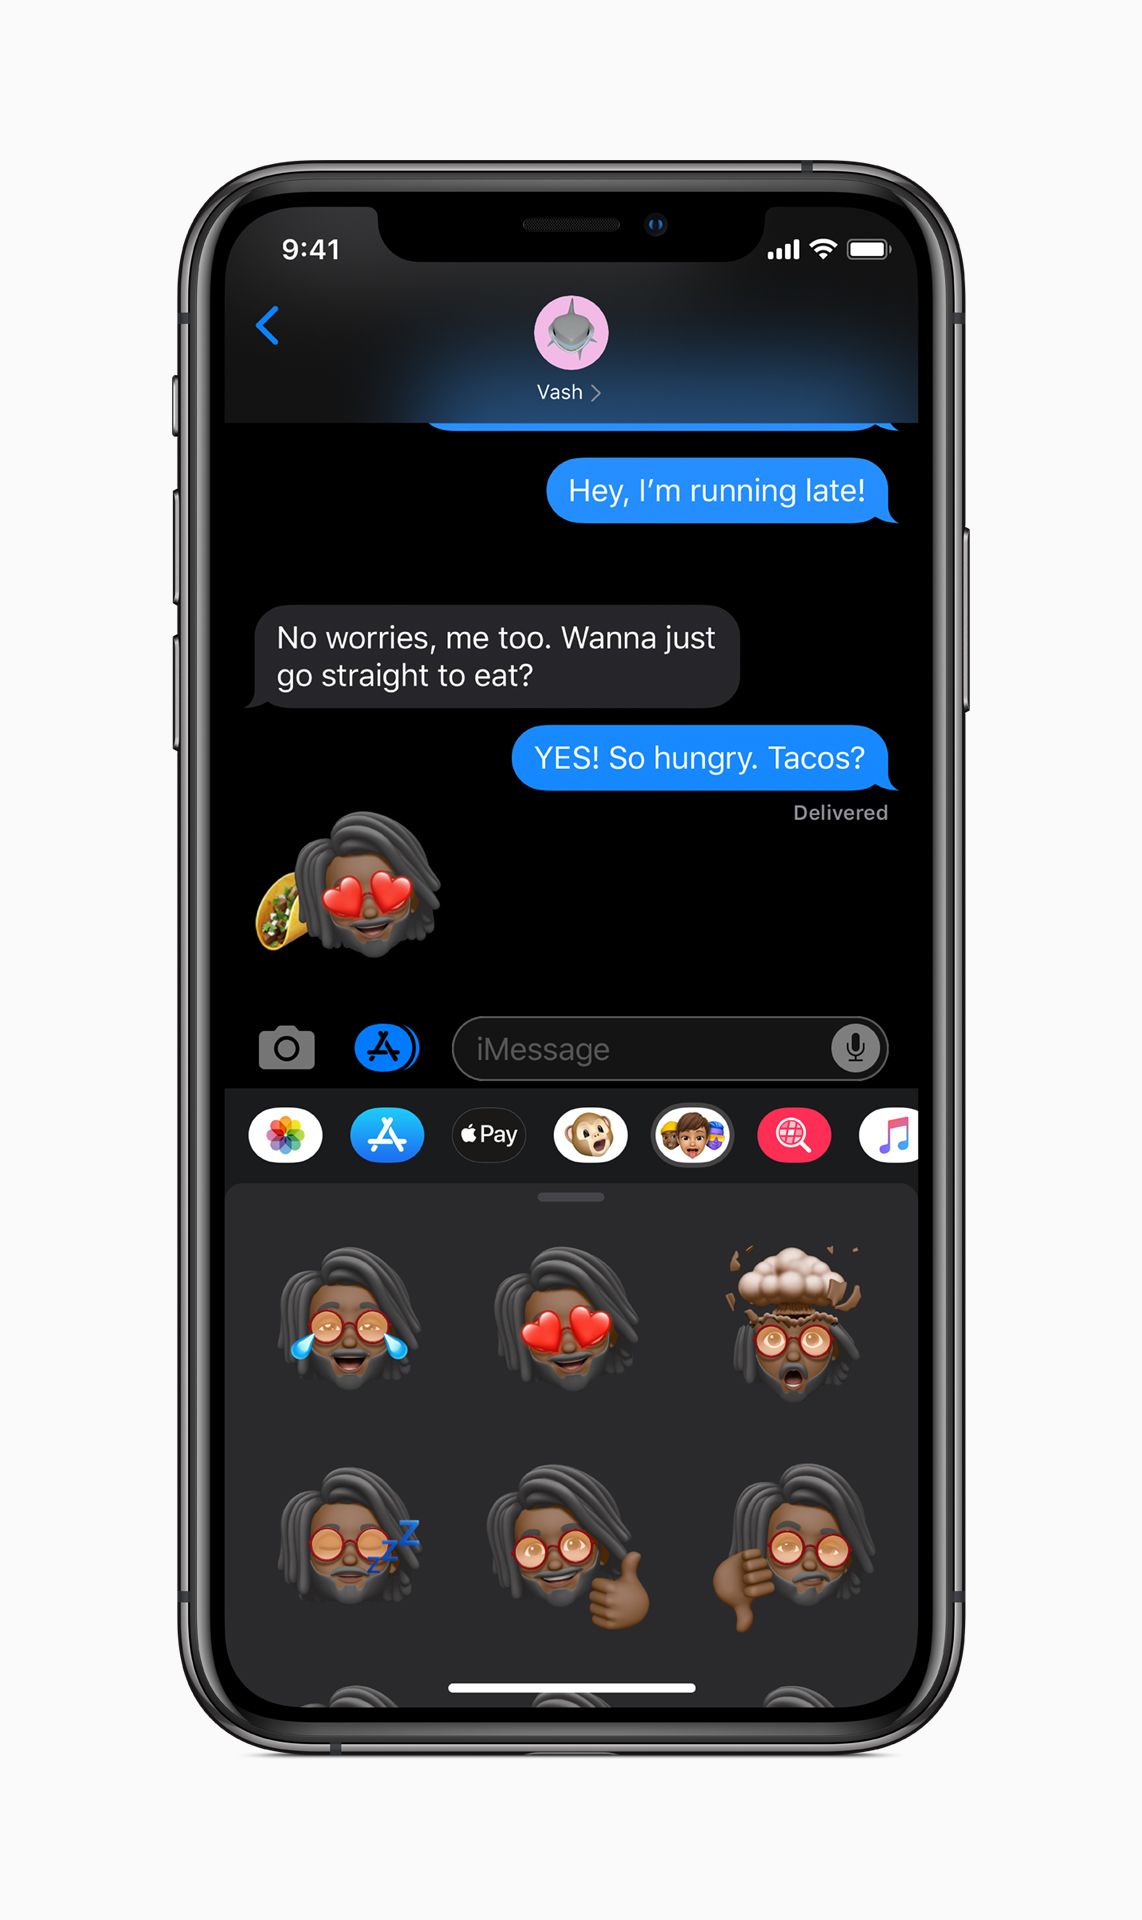 5b96085e52 Apple-ios-13-messages-memoji-stickers-screen-iphone-xs-06032019_carousel.jpg